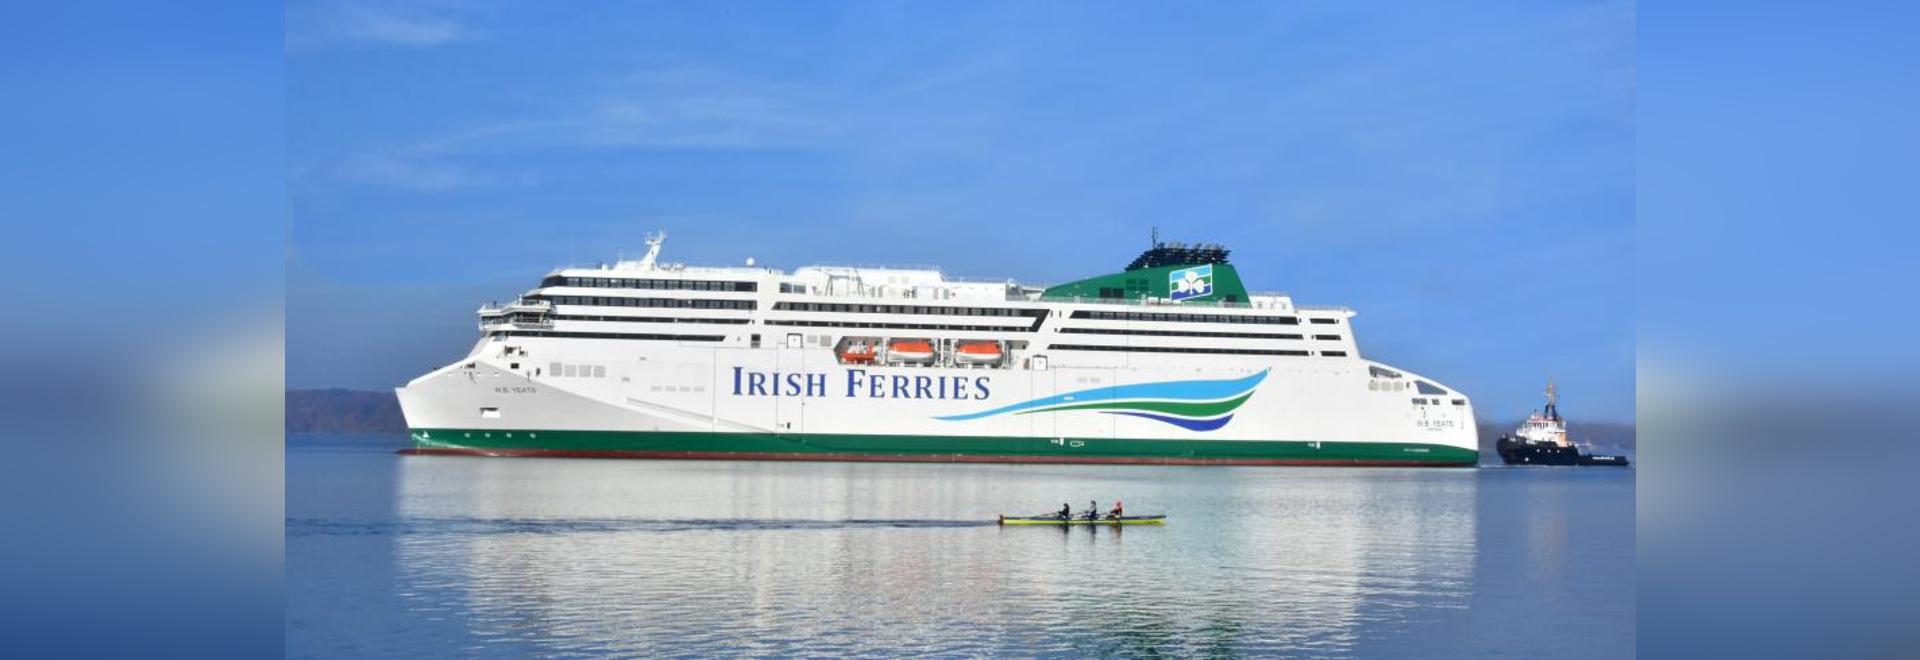 Irish Ferries Starts Legal Process to Challenge NTA Decision